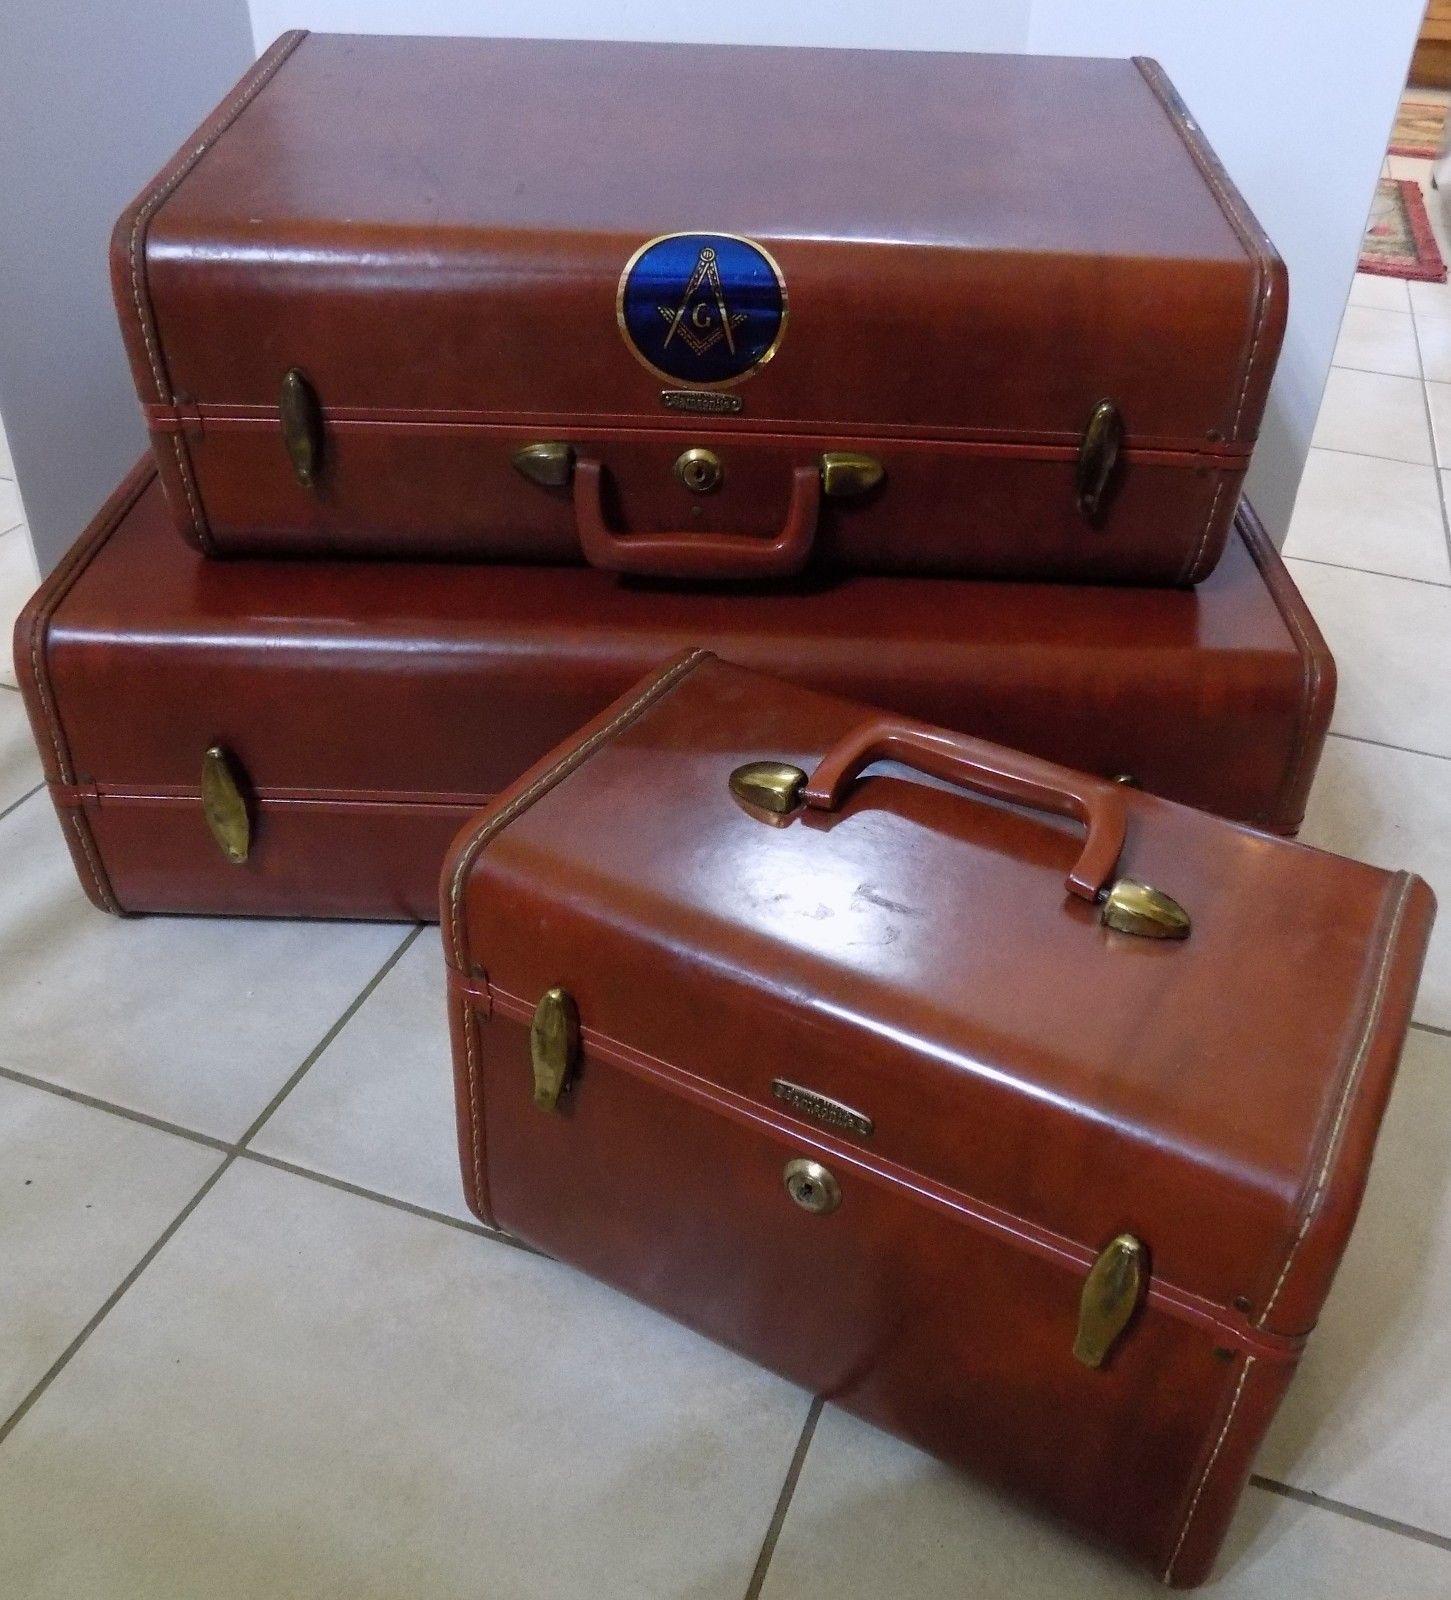 "Vitg Samsonite Shwayder Bros 20"" Hardcase Suitcase Home Decor End Table Night st"